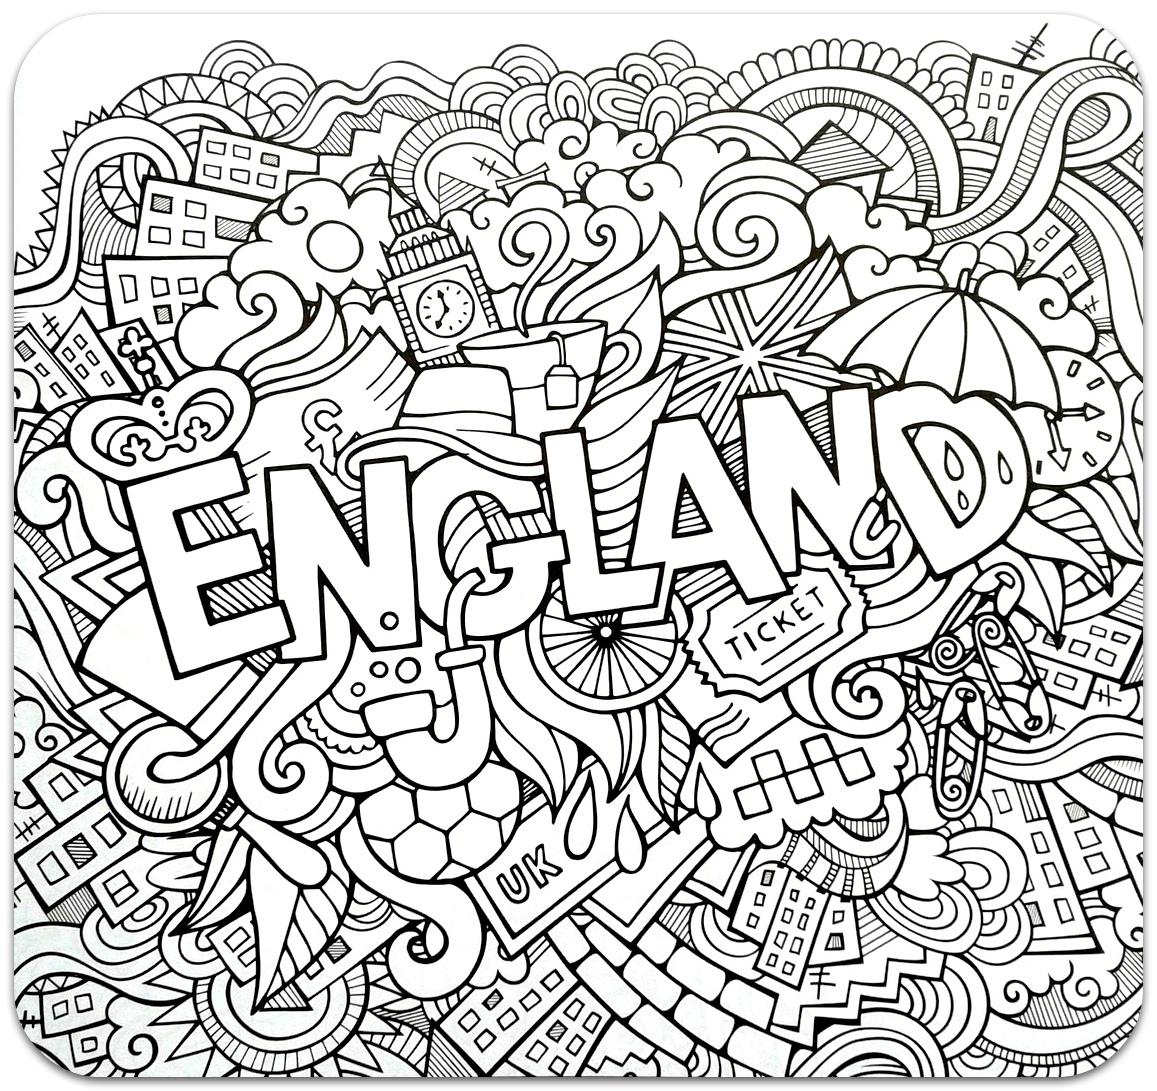 розмальовки для дорослих, розмальовки антистрес, країни, подорож, раскраски антистресс, страны, англія